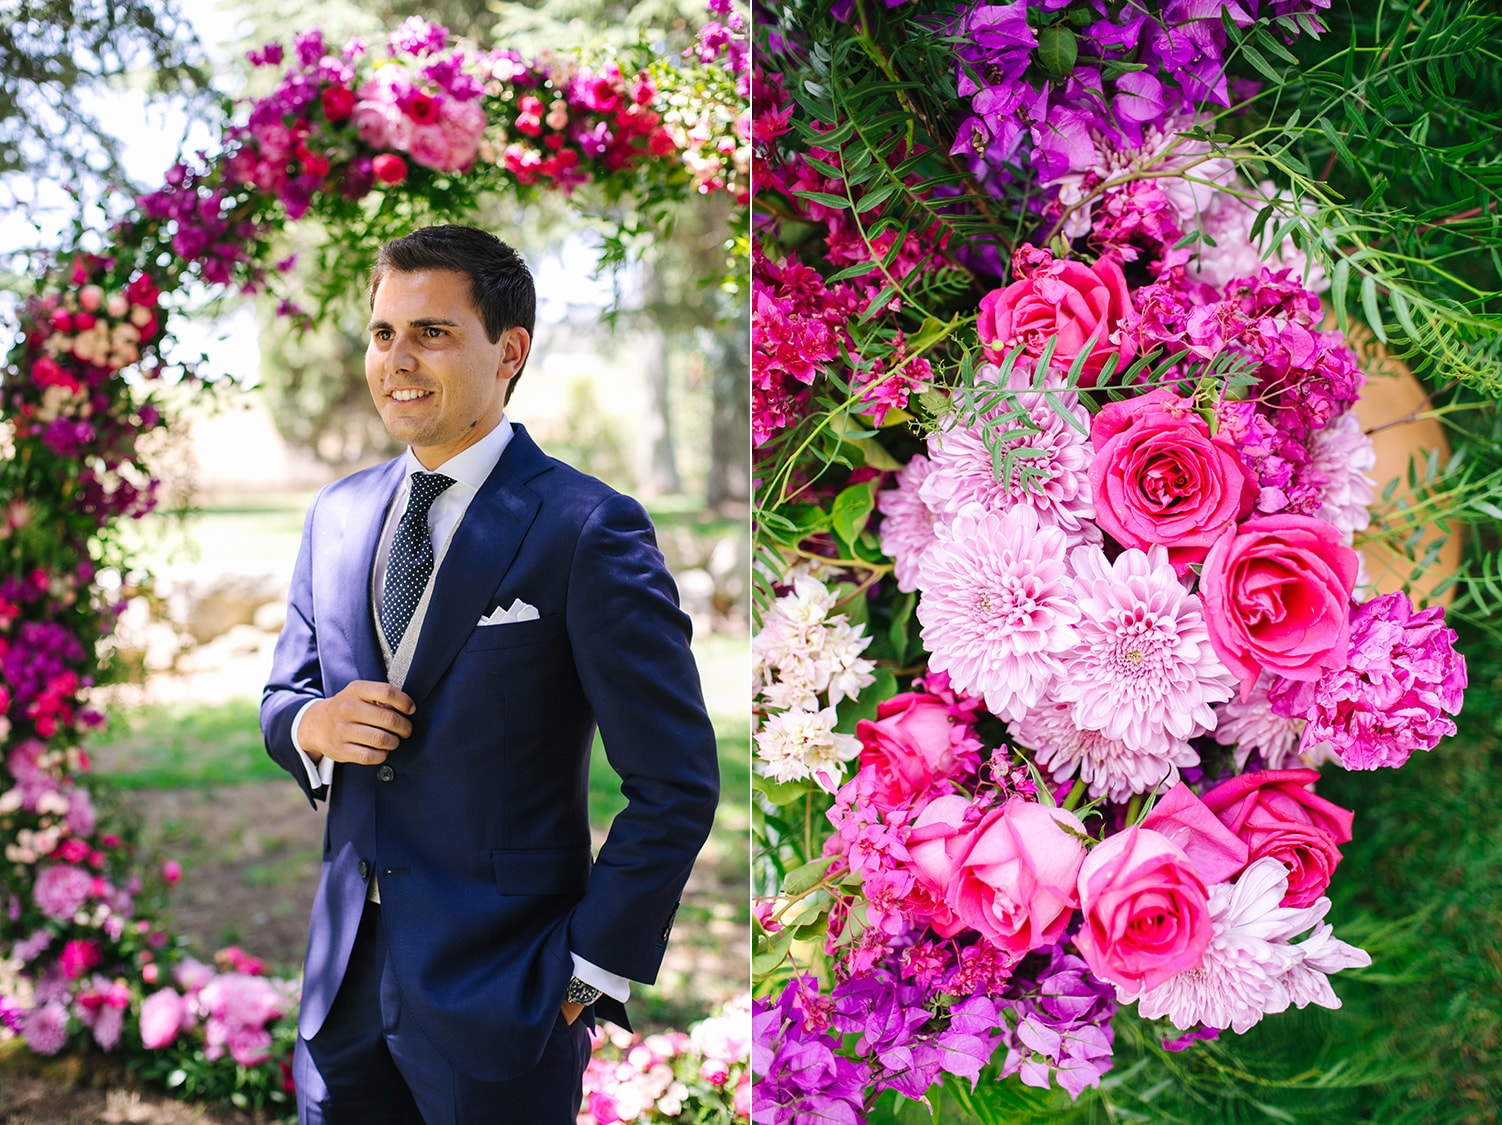 paulagfurio_bouganvillea_wedding_spain_015.jpg